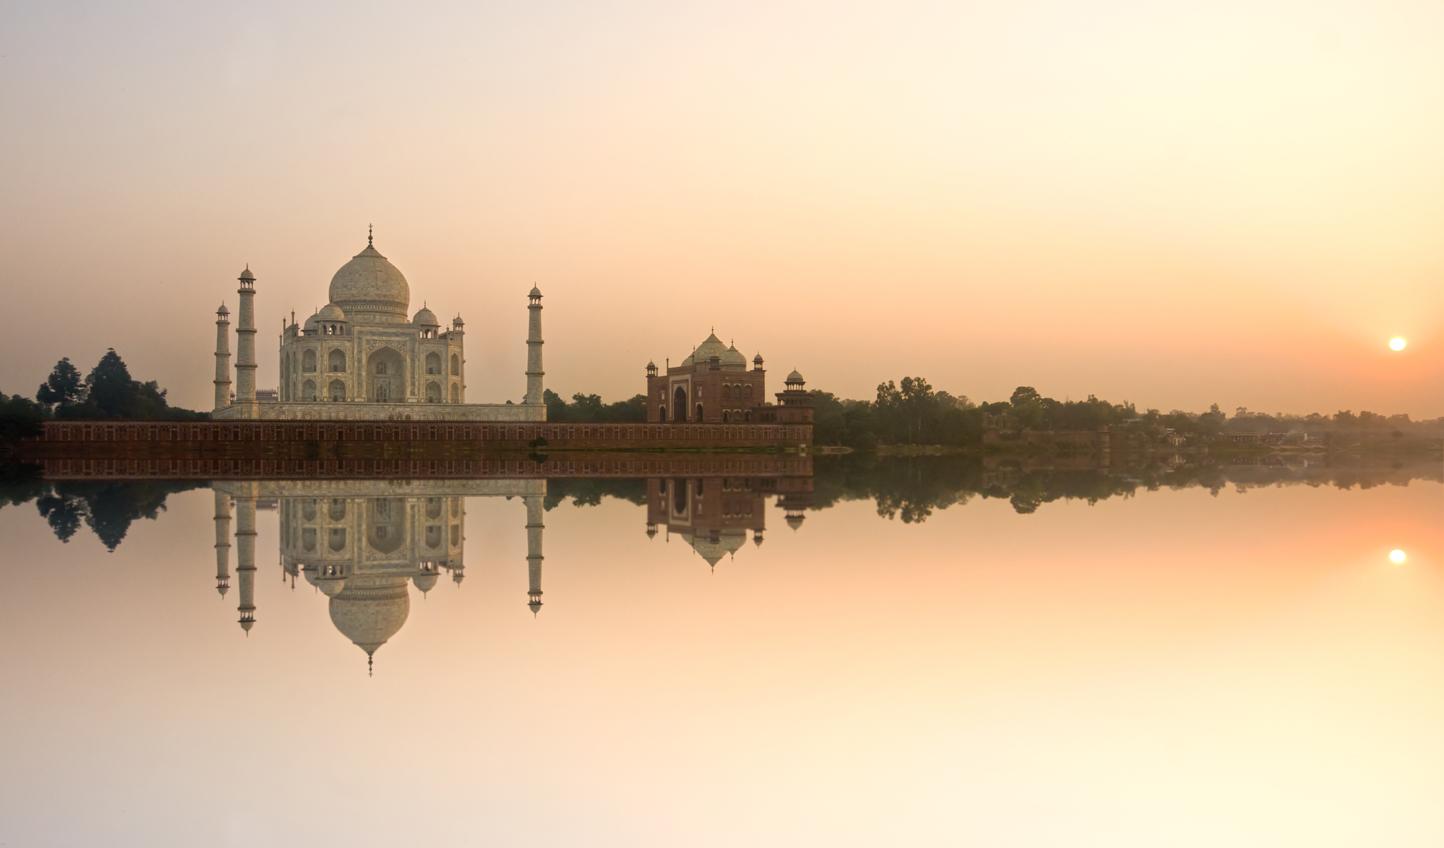 See the wonder of the Taj Mahal